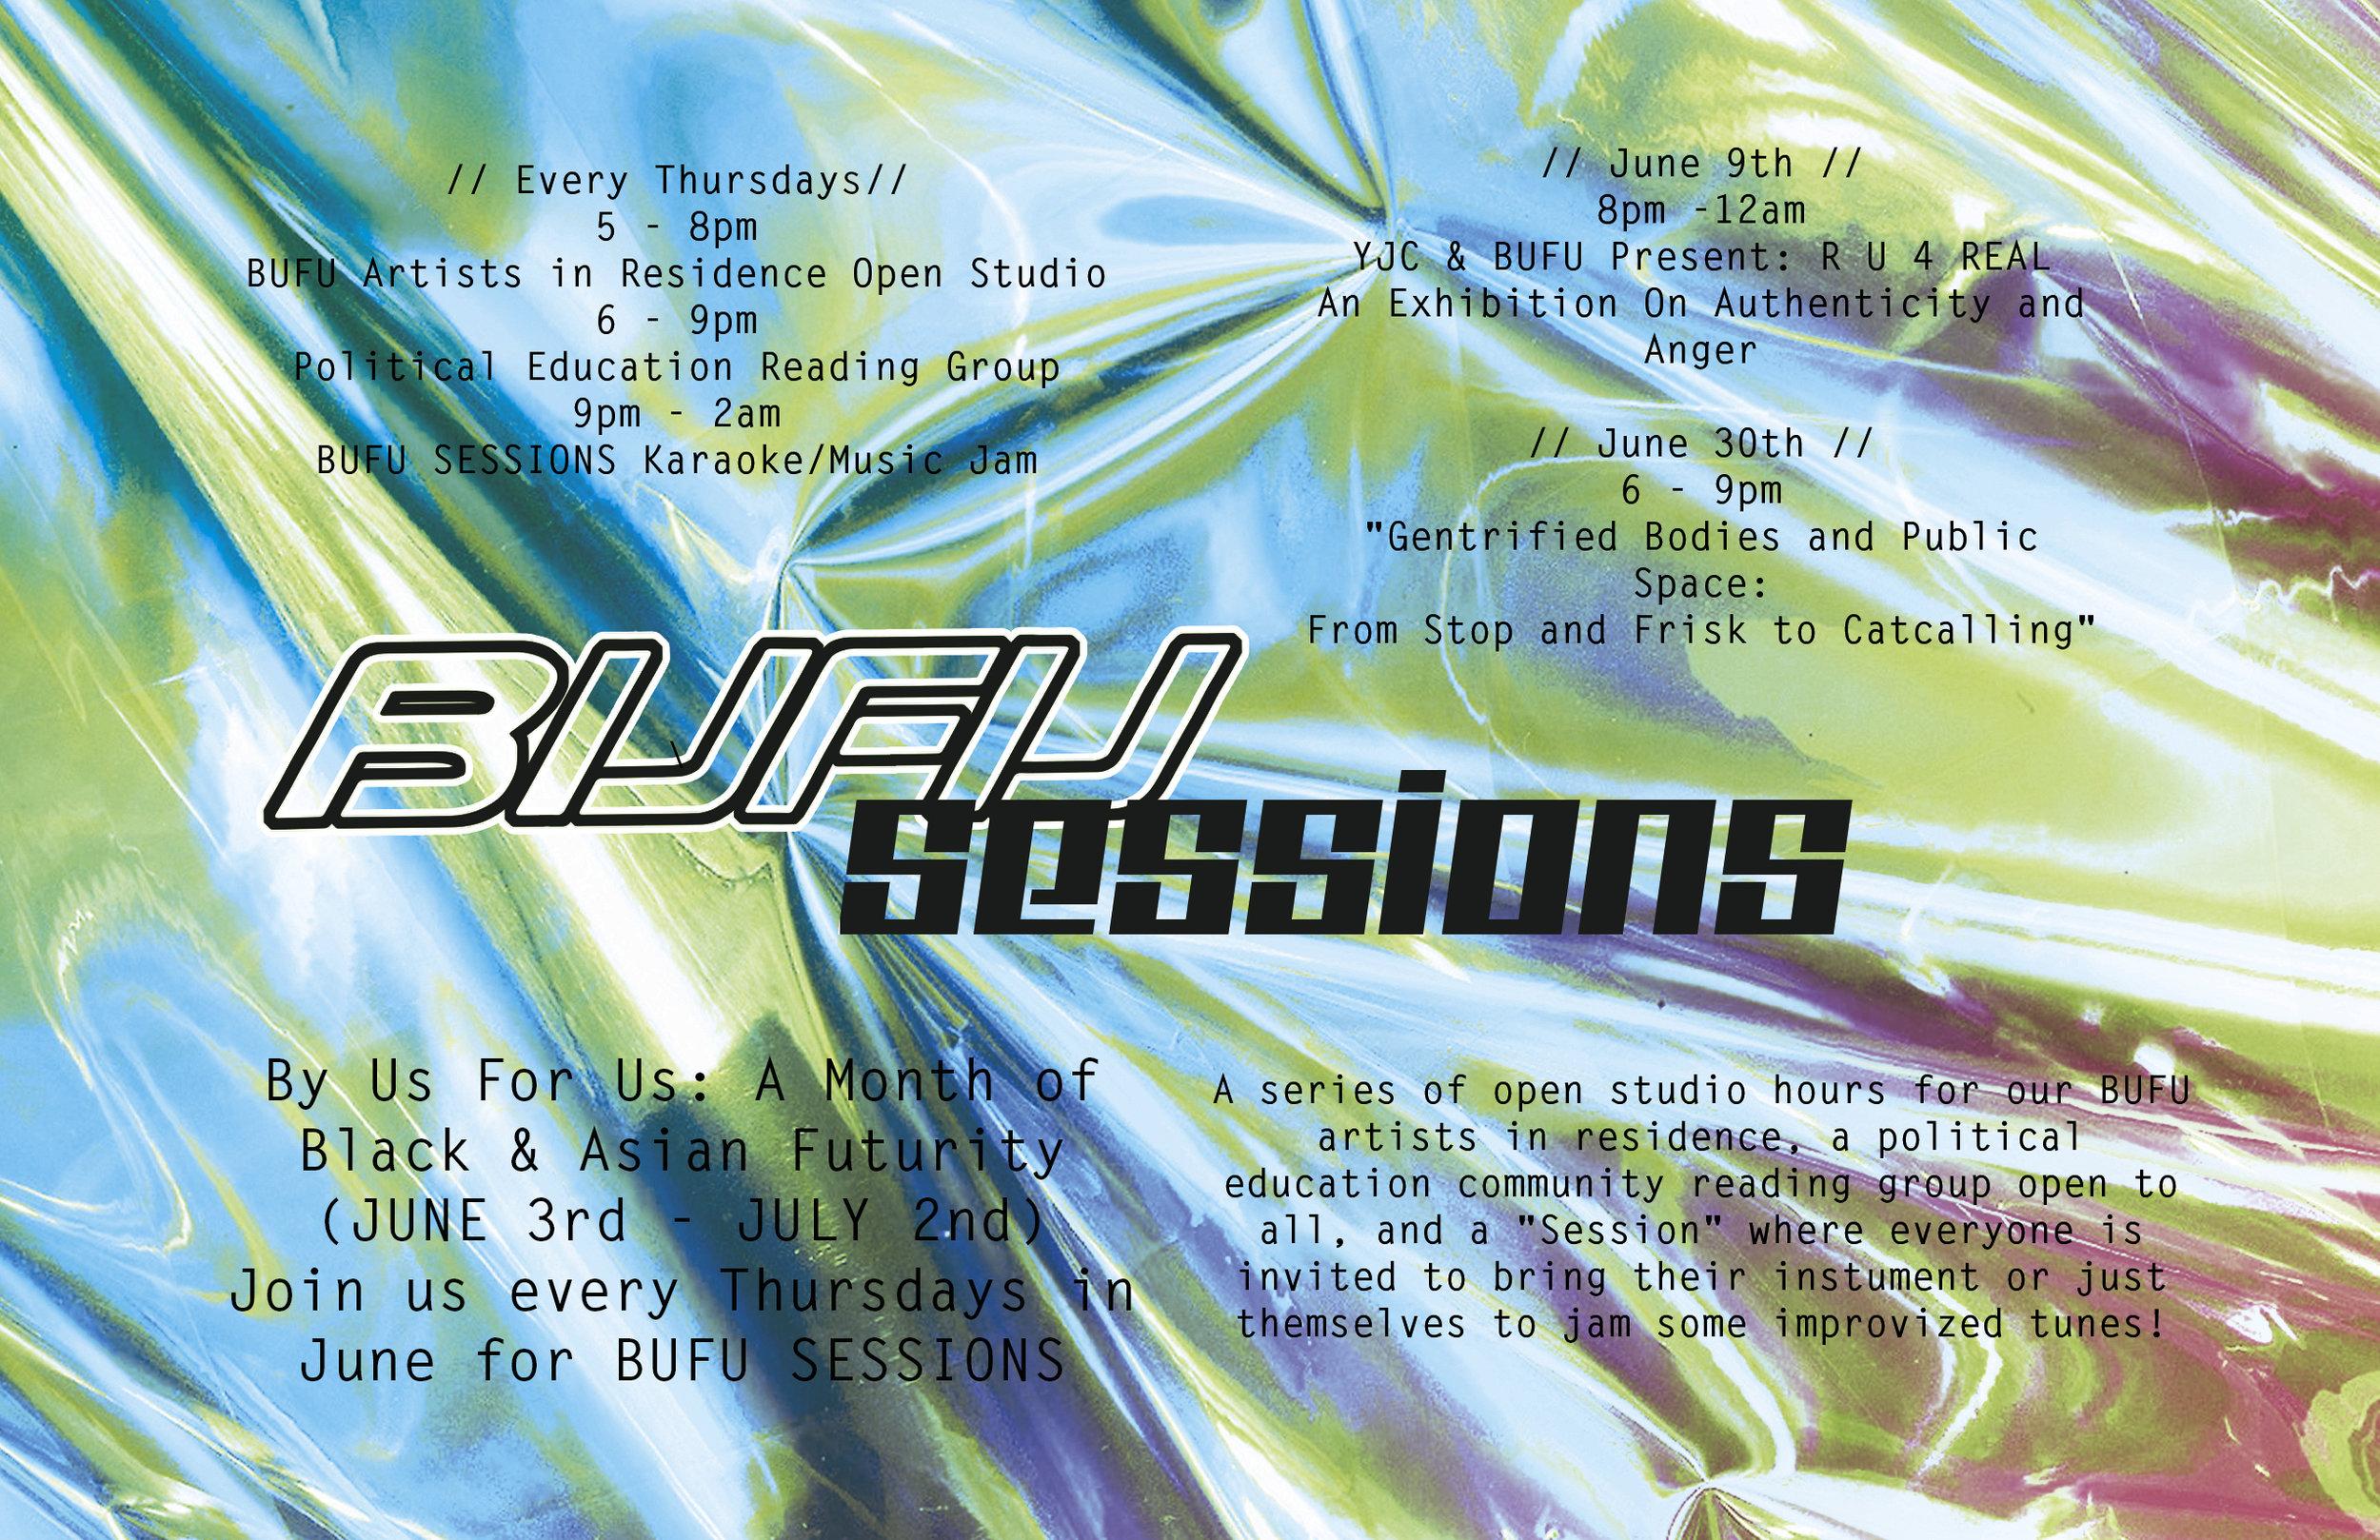 BUFU_sessionslonger.jpg